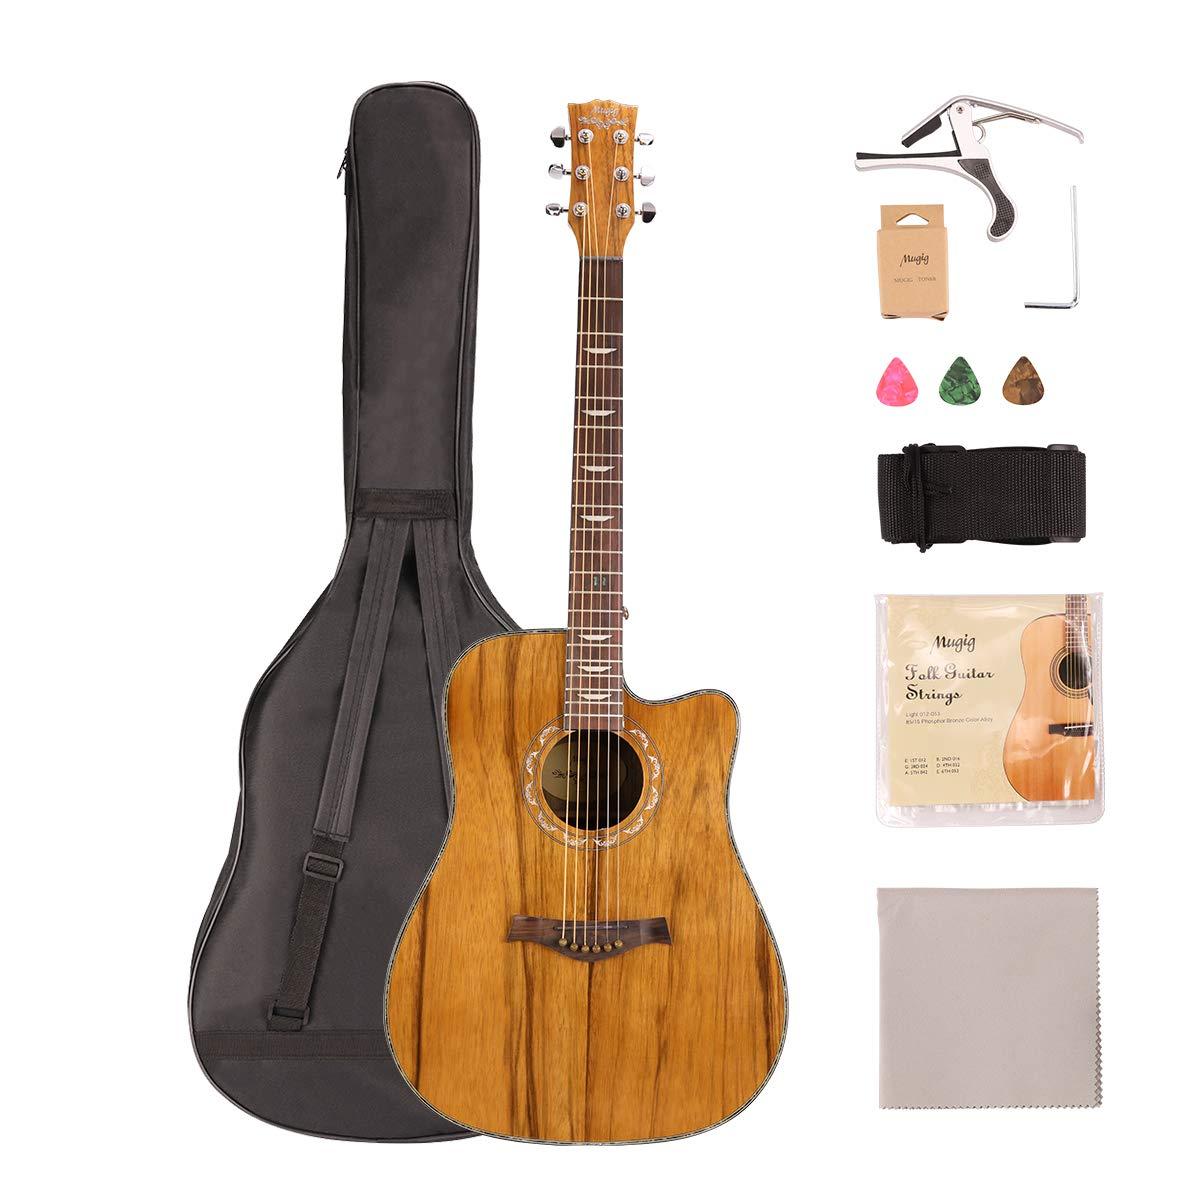 Mugig Steel-String Acoustic Guitar Bundle 41Inch with Gig Bag, Tuner, Strings, Strap, Picks for Guitar Professional,Beginner by Mugig (Image #1)